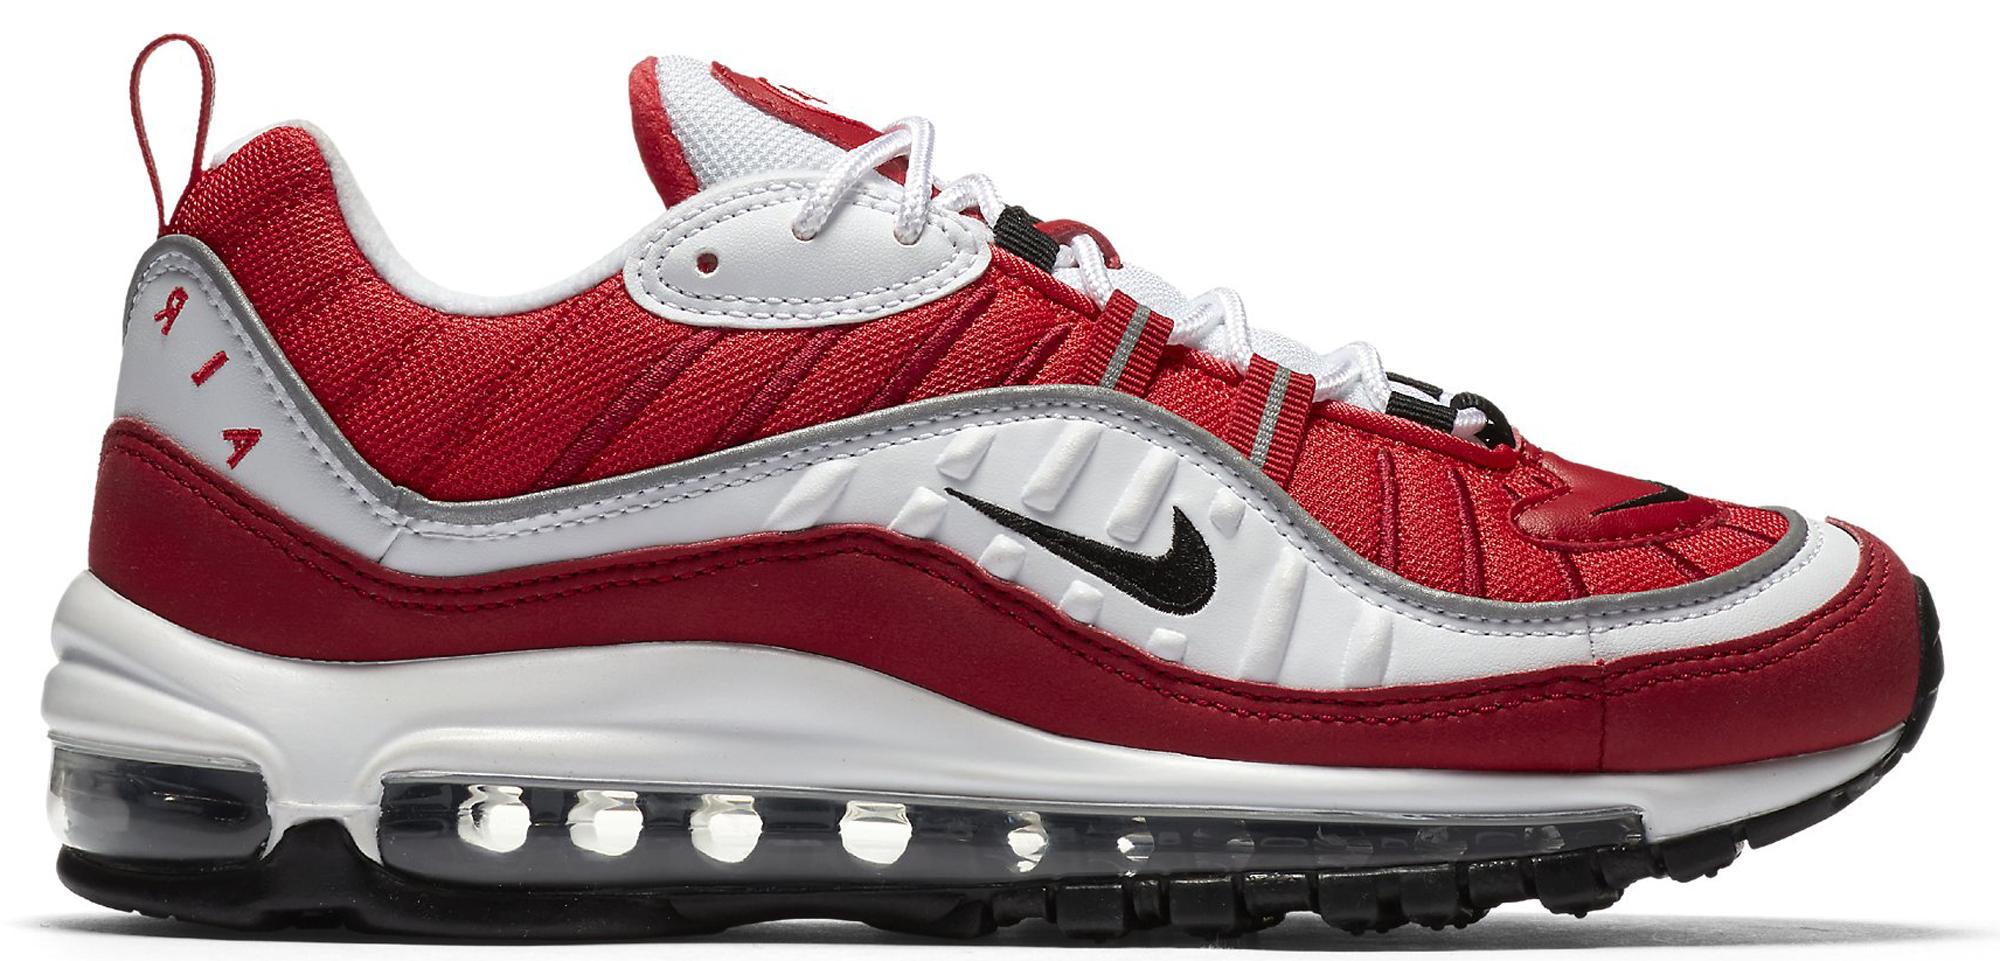 Nike Air Max 98 Gym Red (W) - AH6799-101